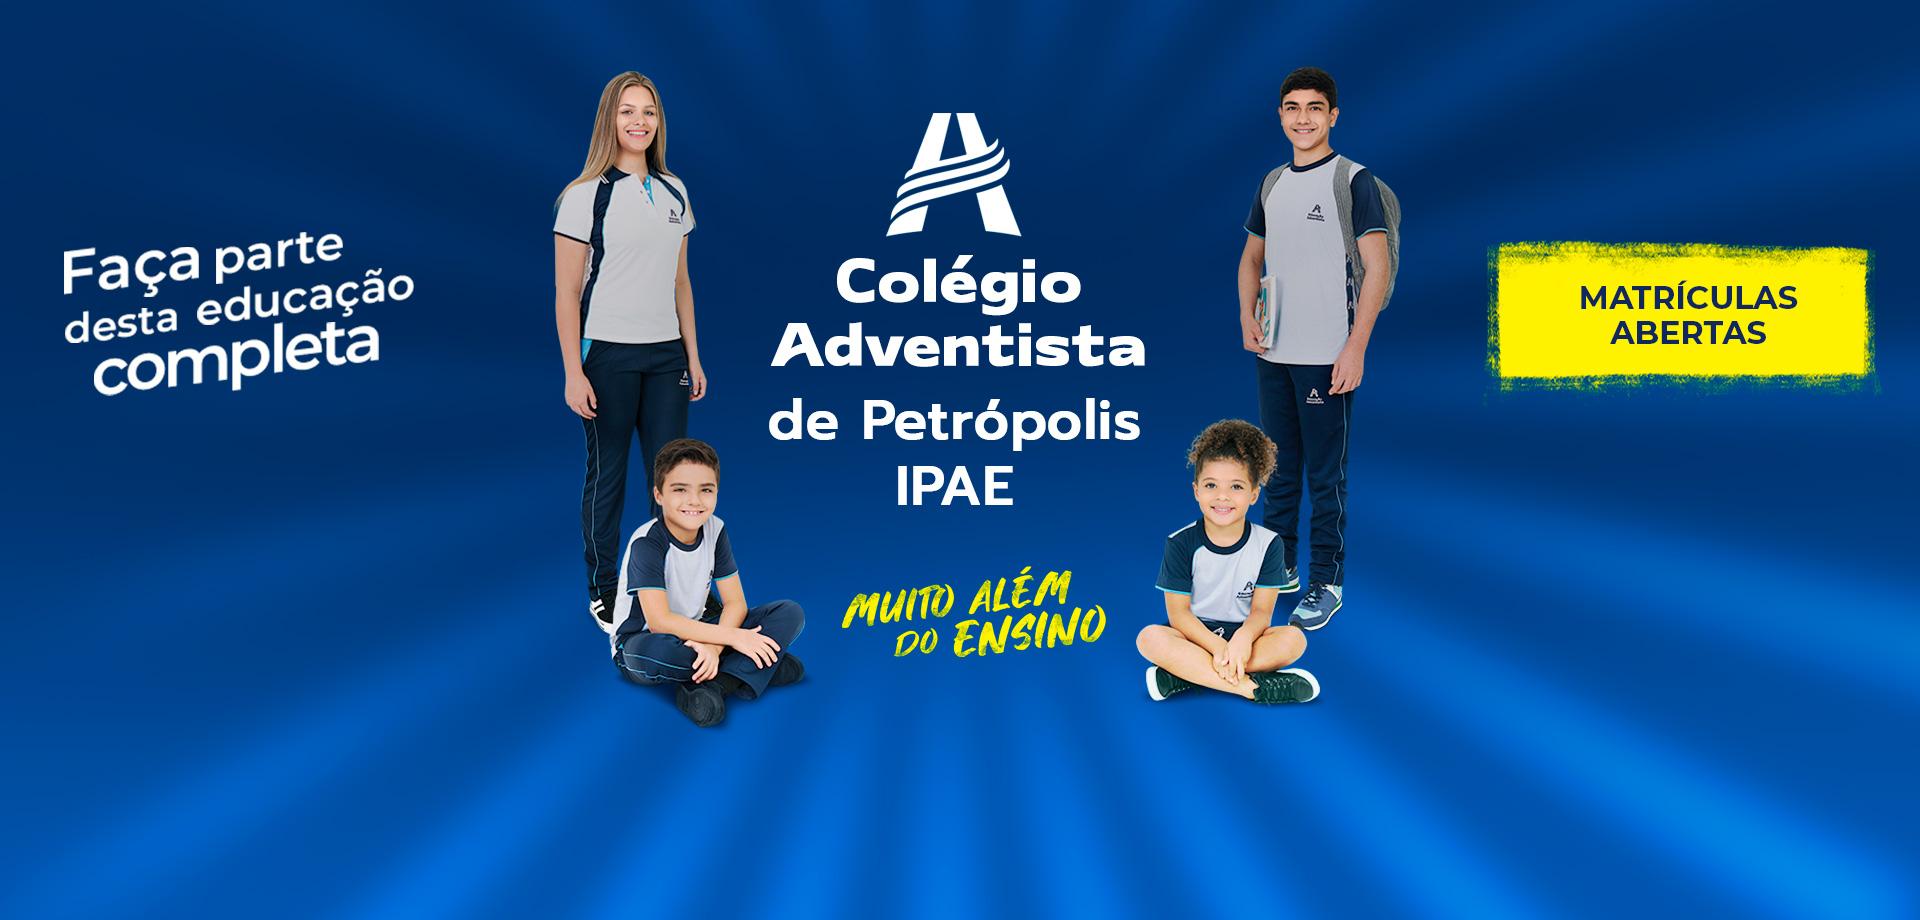 Colégio Adventista de Petrópolis - Campus Residencial - IPAE